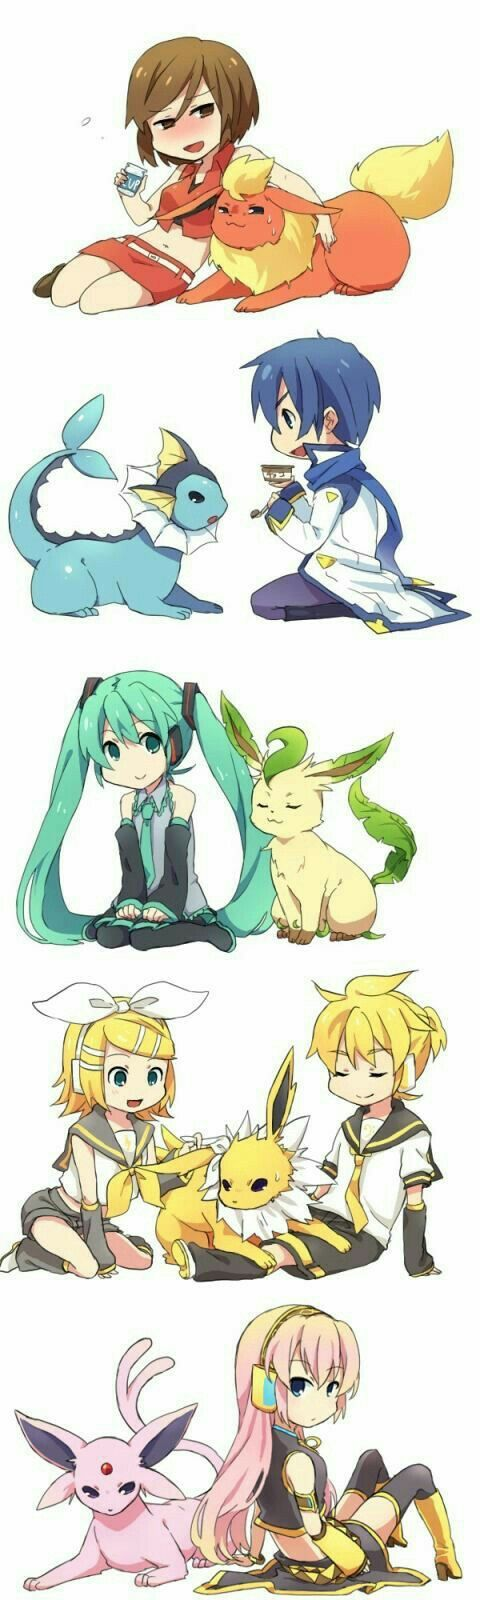 Anime Characters Born On July 9 : Best anime otaku images on pinterest manga